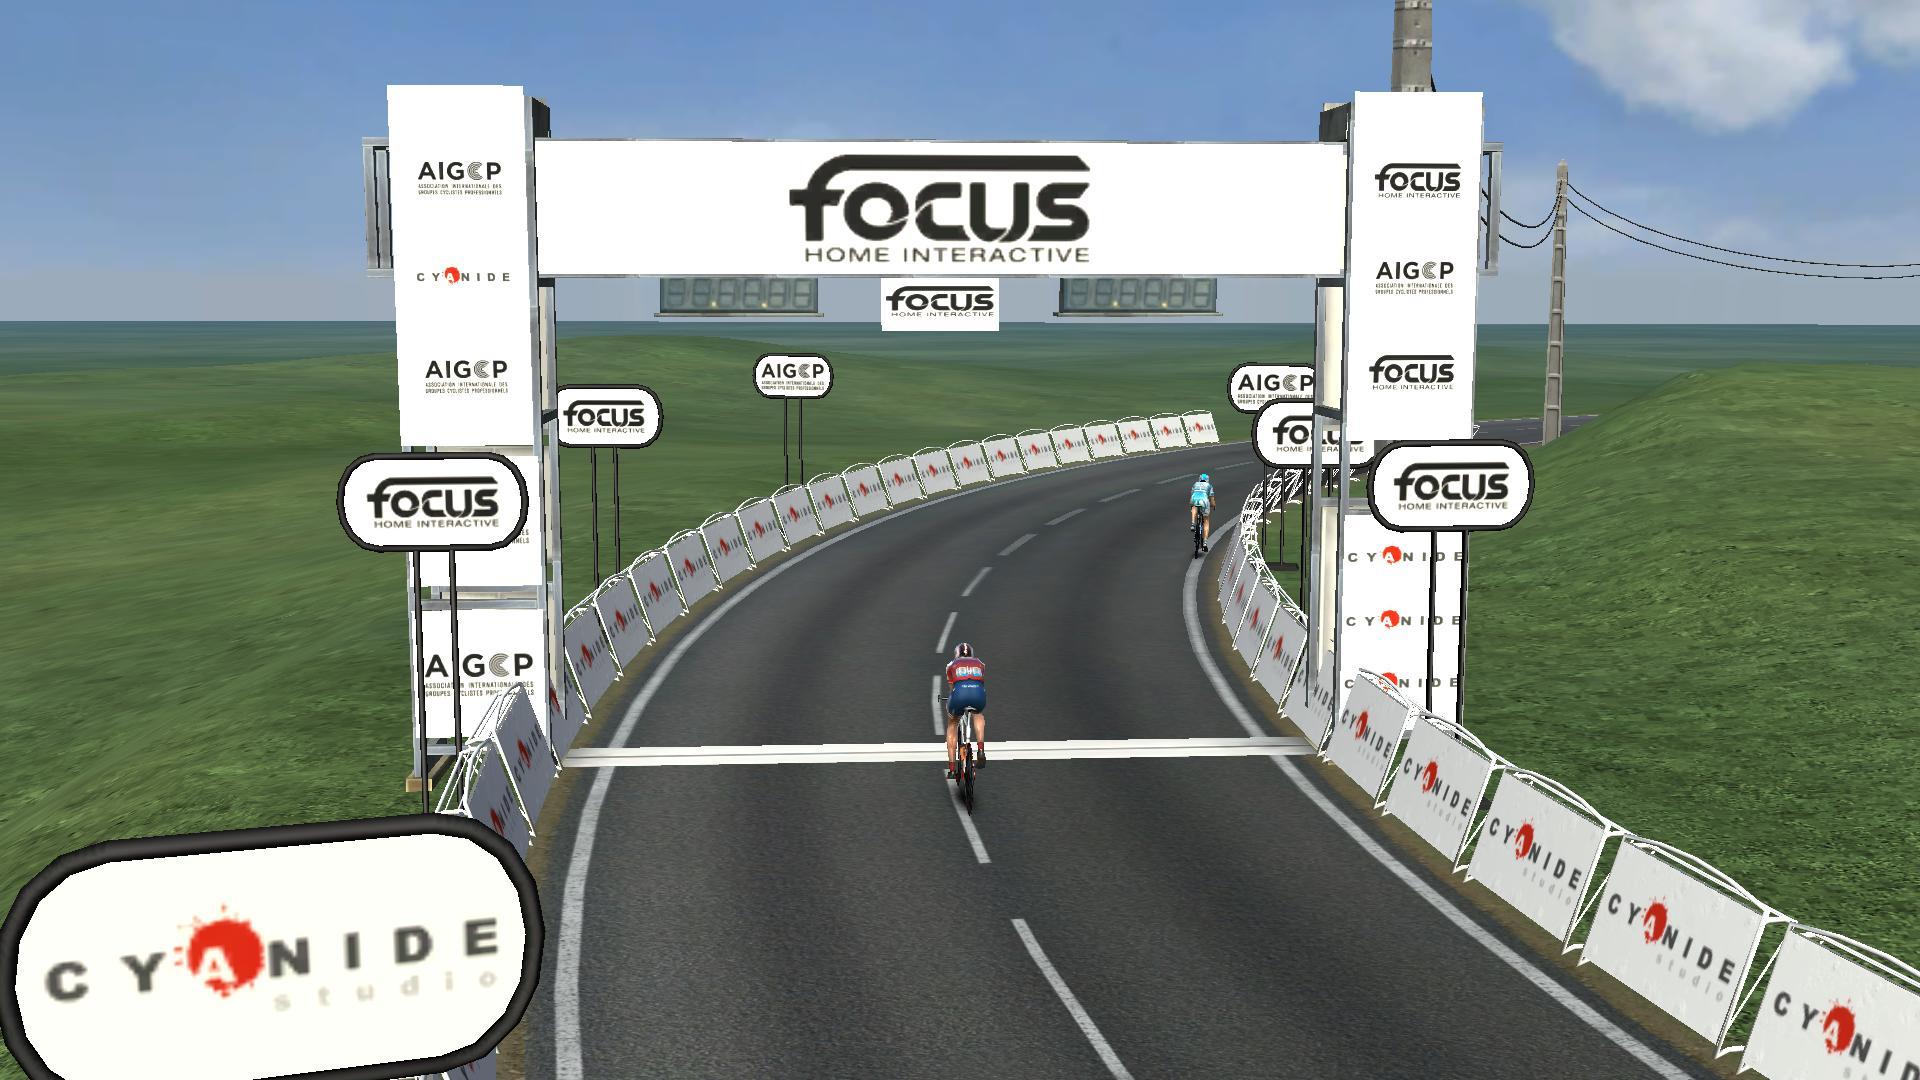 pcmdaily.com/images/mg/2020/Reports/PTHC/Slovenie/slov4-10.jpg